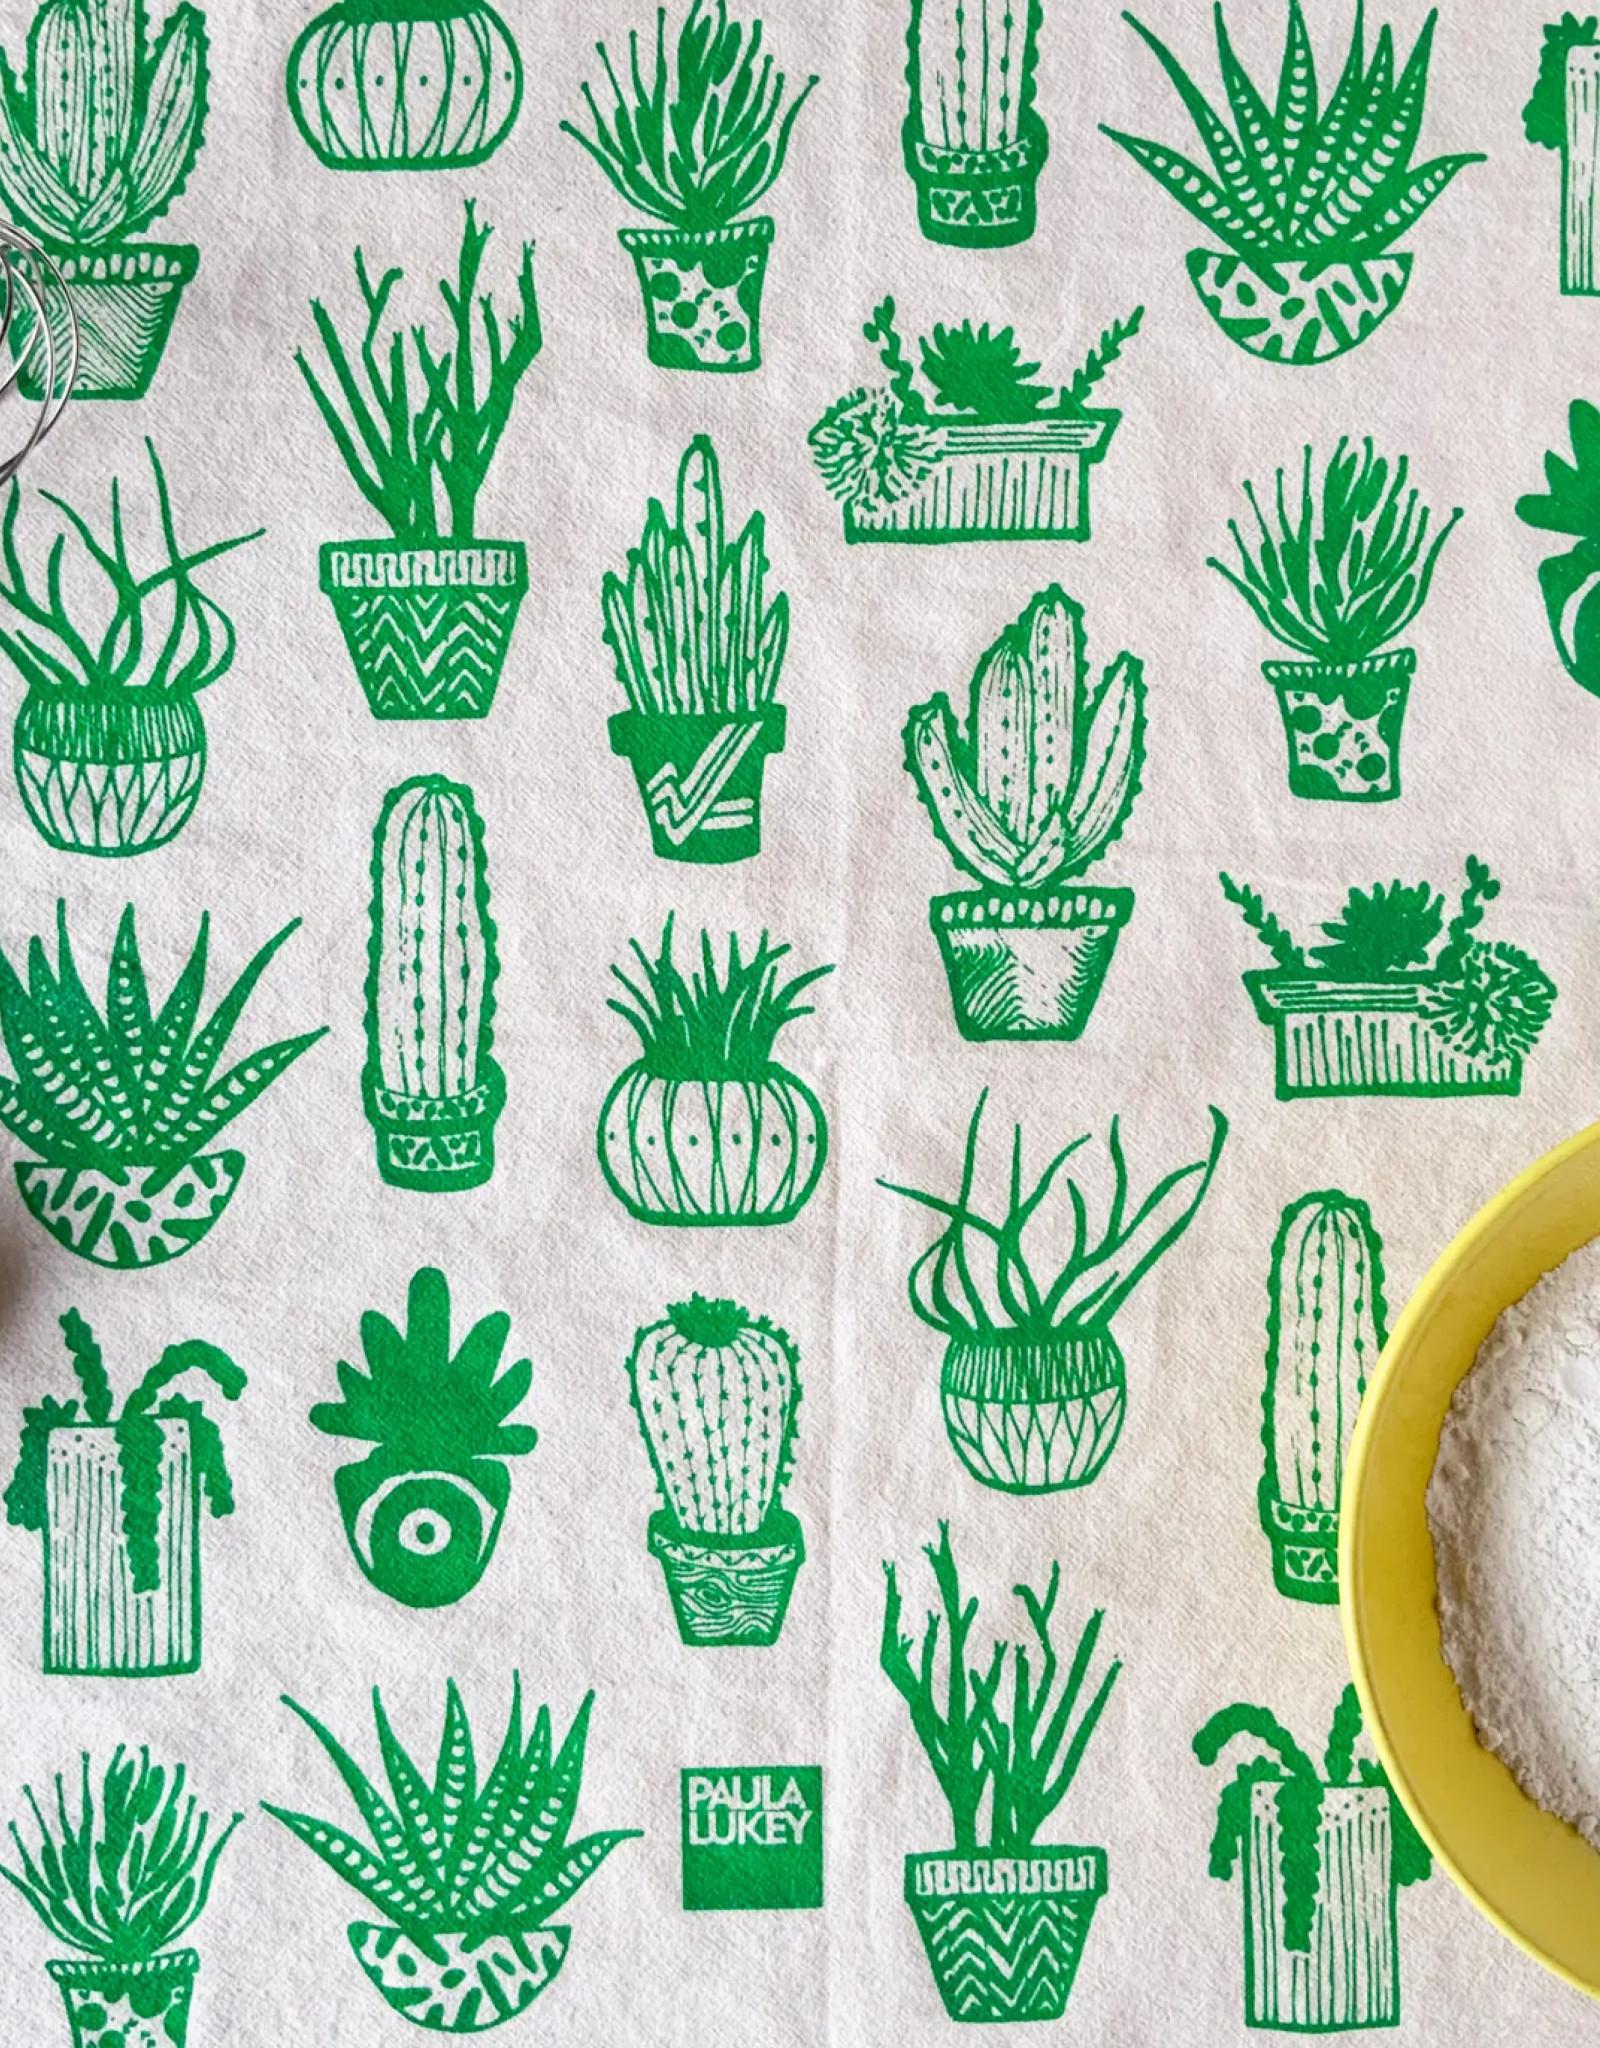 HAVYN Succulents Tea Towel - Green